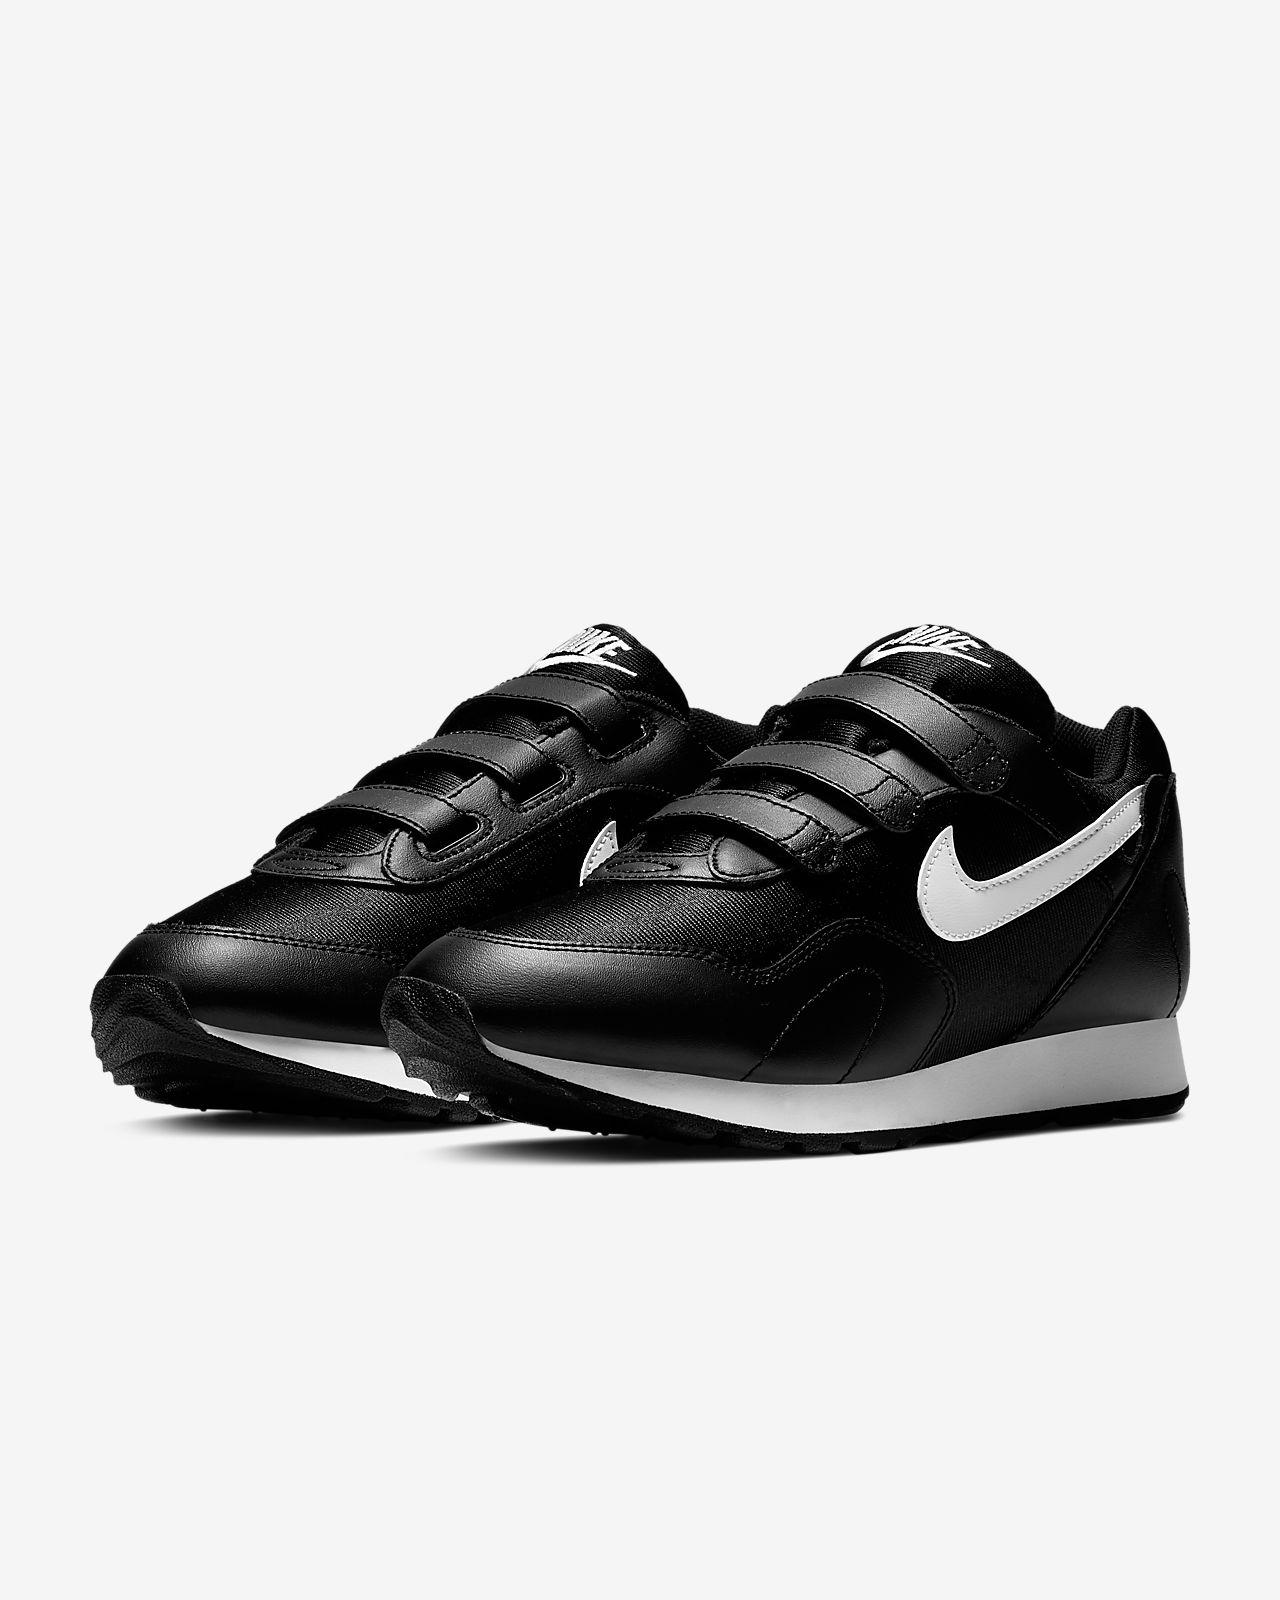 huge discount b7fad e9179 ... Nike Outburst V Women s Shoe